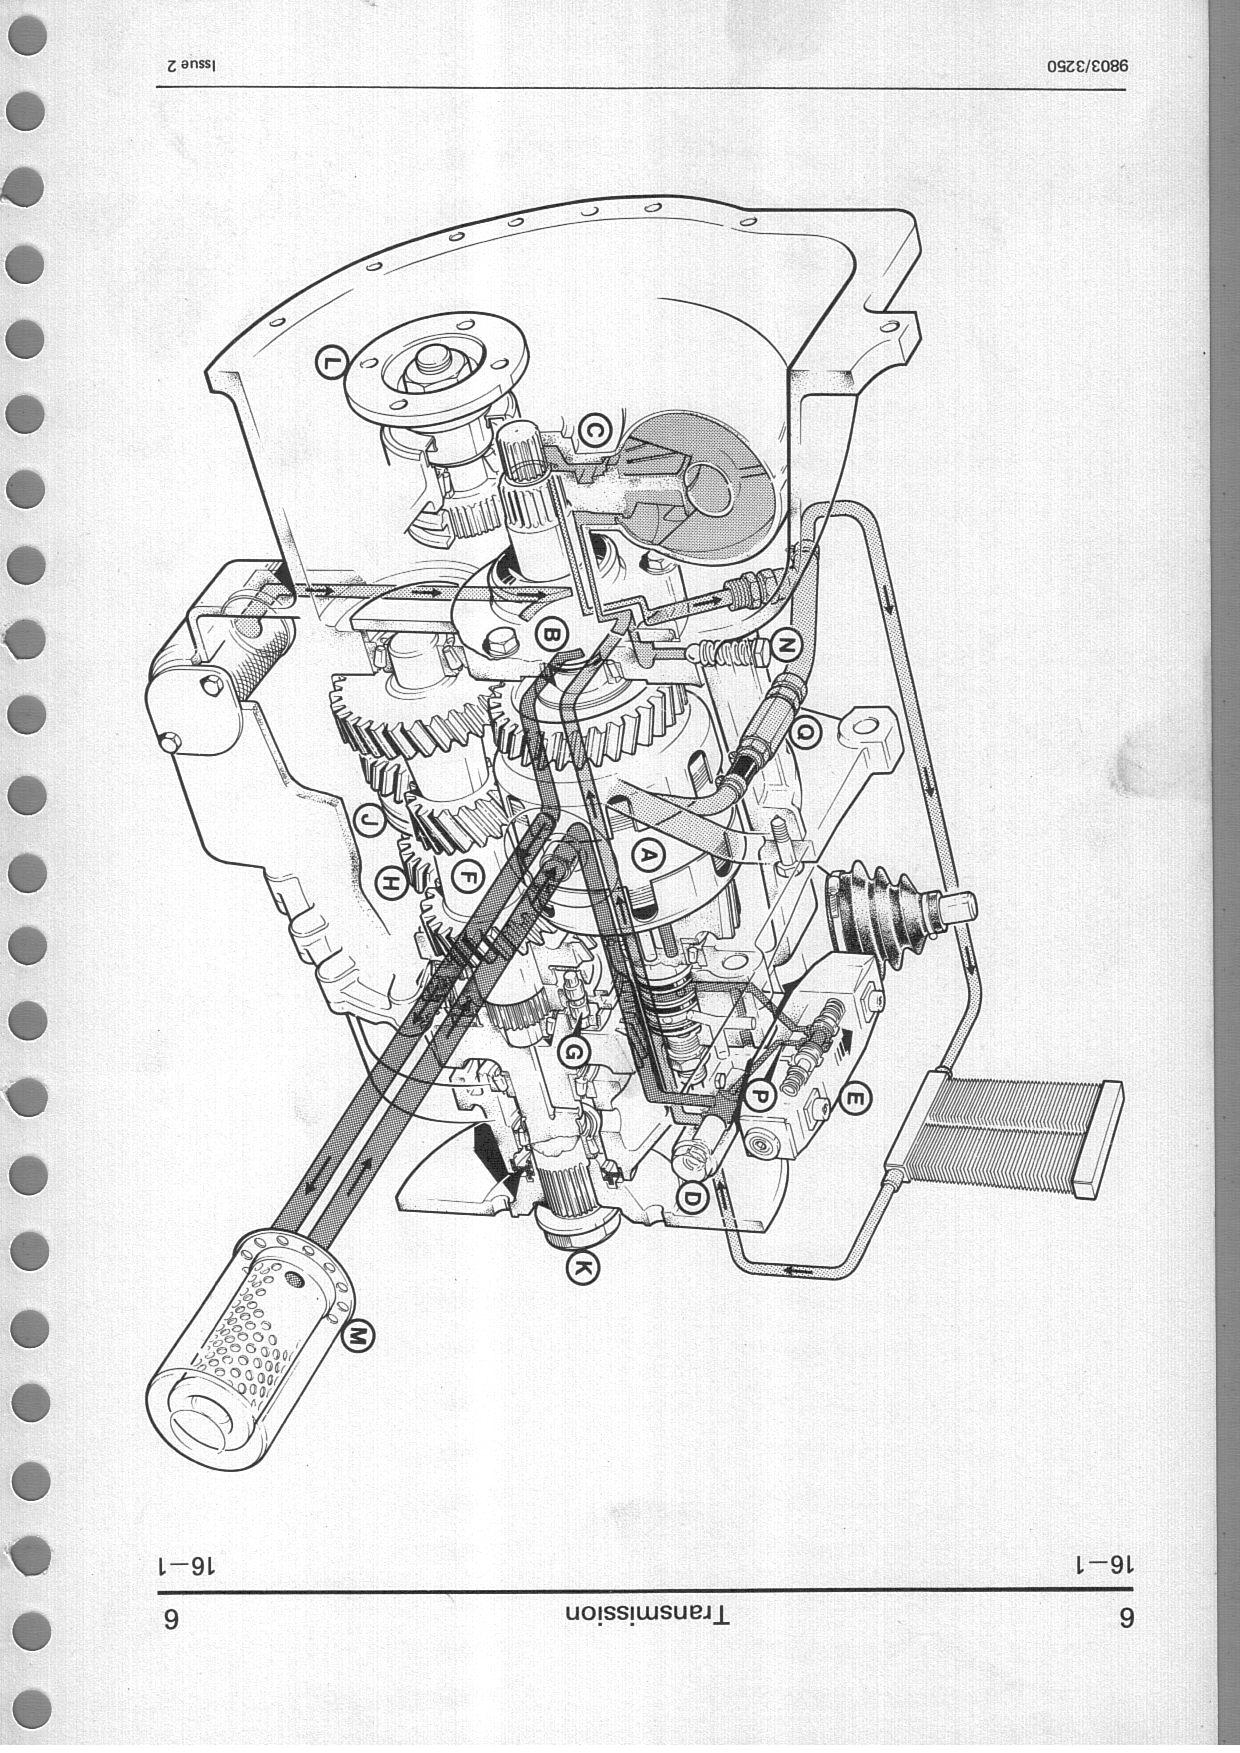 jcb 506c wiring diagram jcb 508c wiring diagram